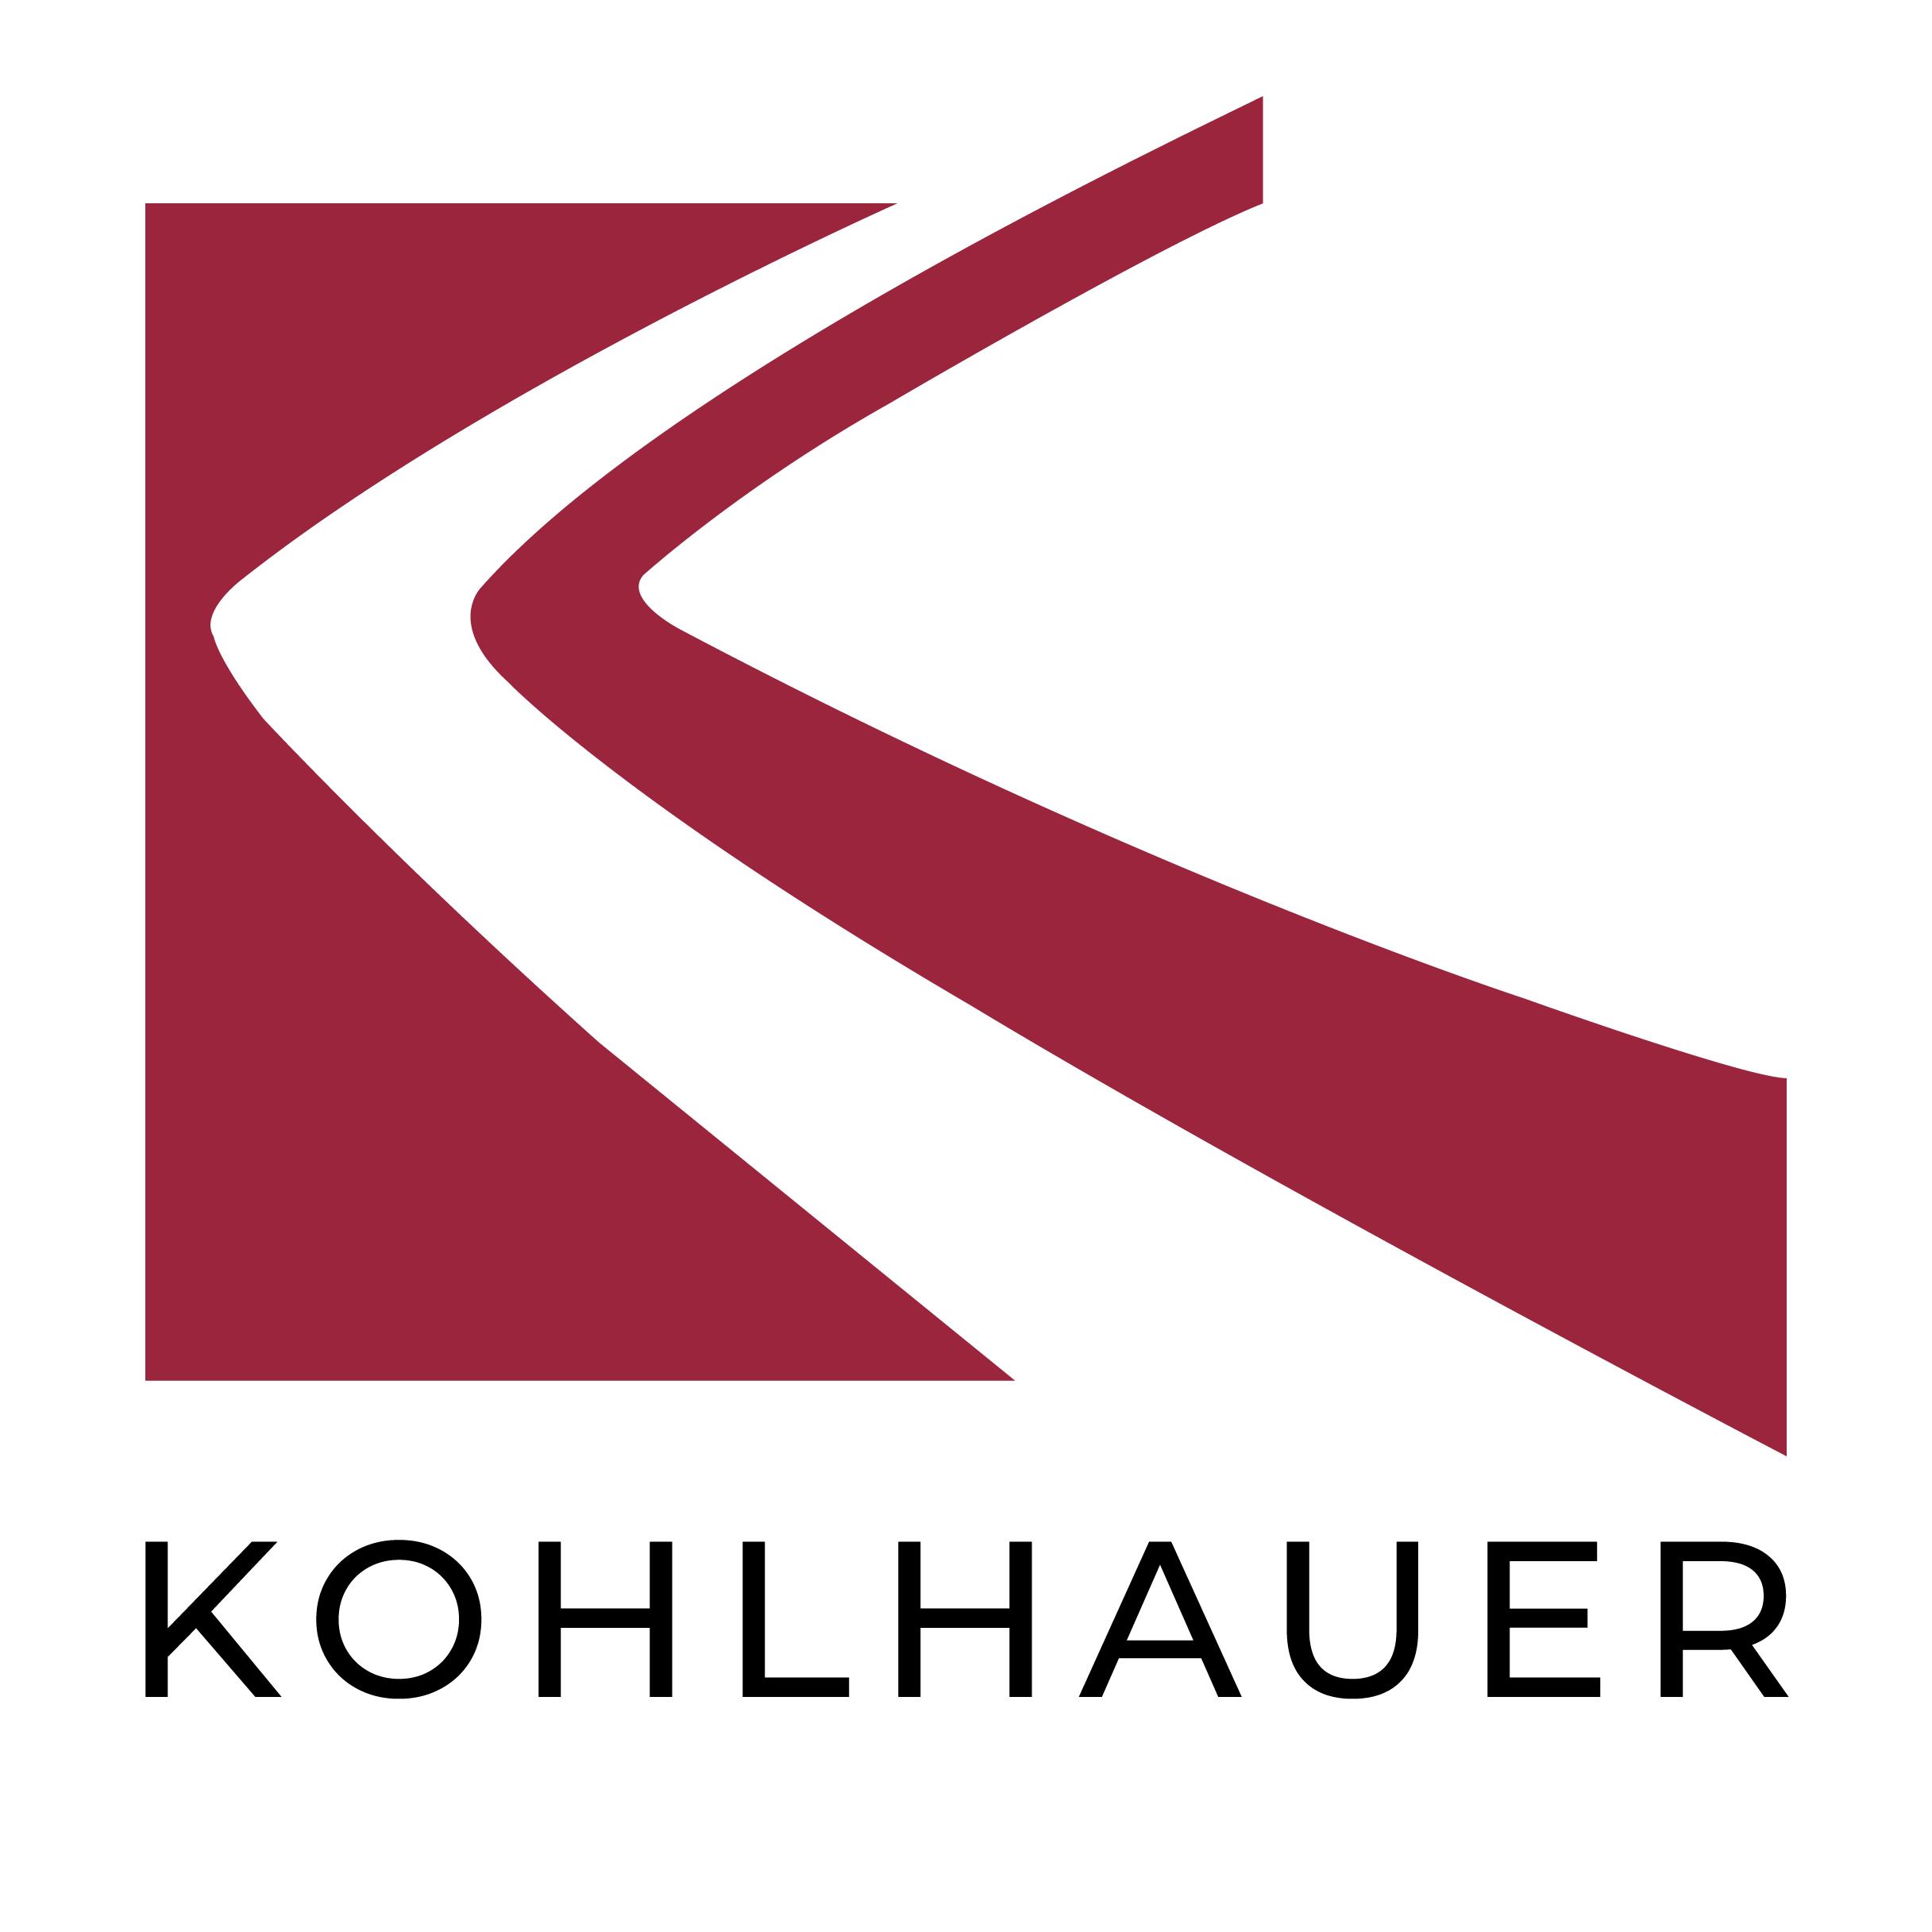 KOHLHAUER